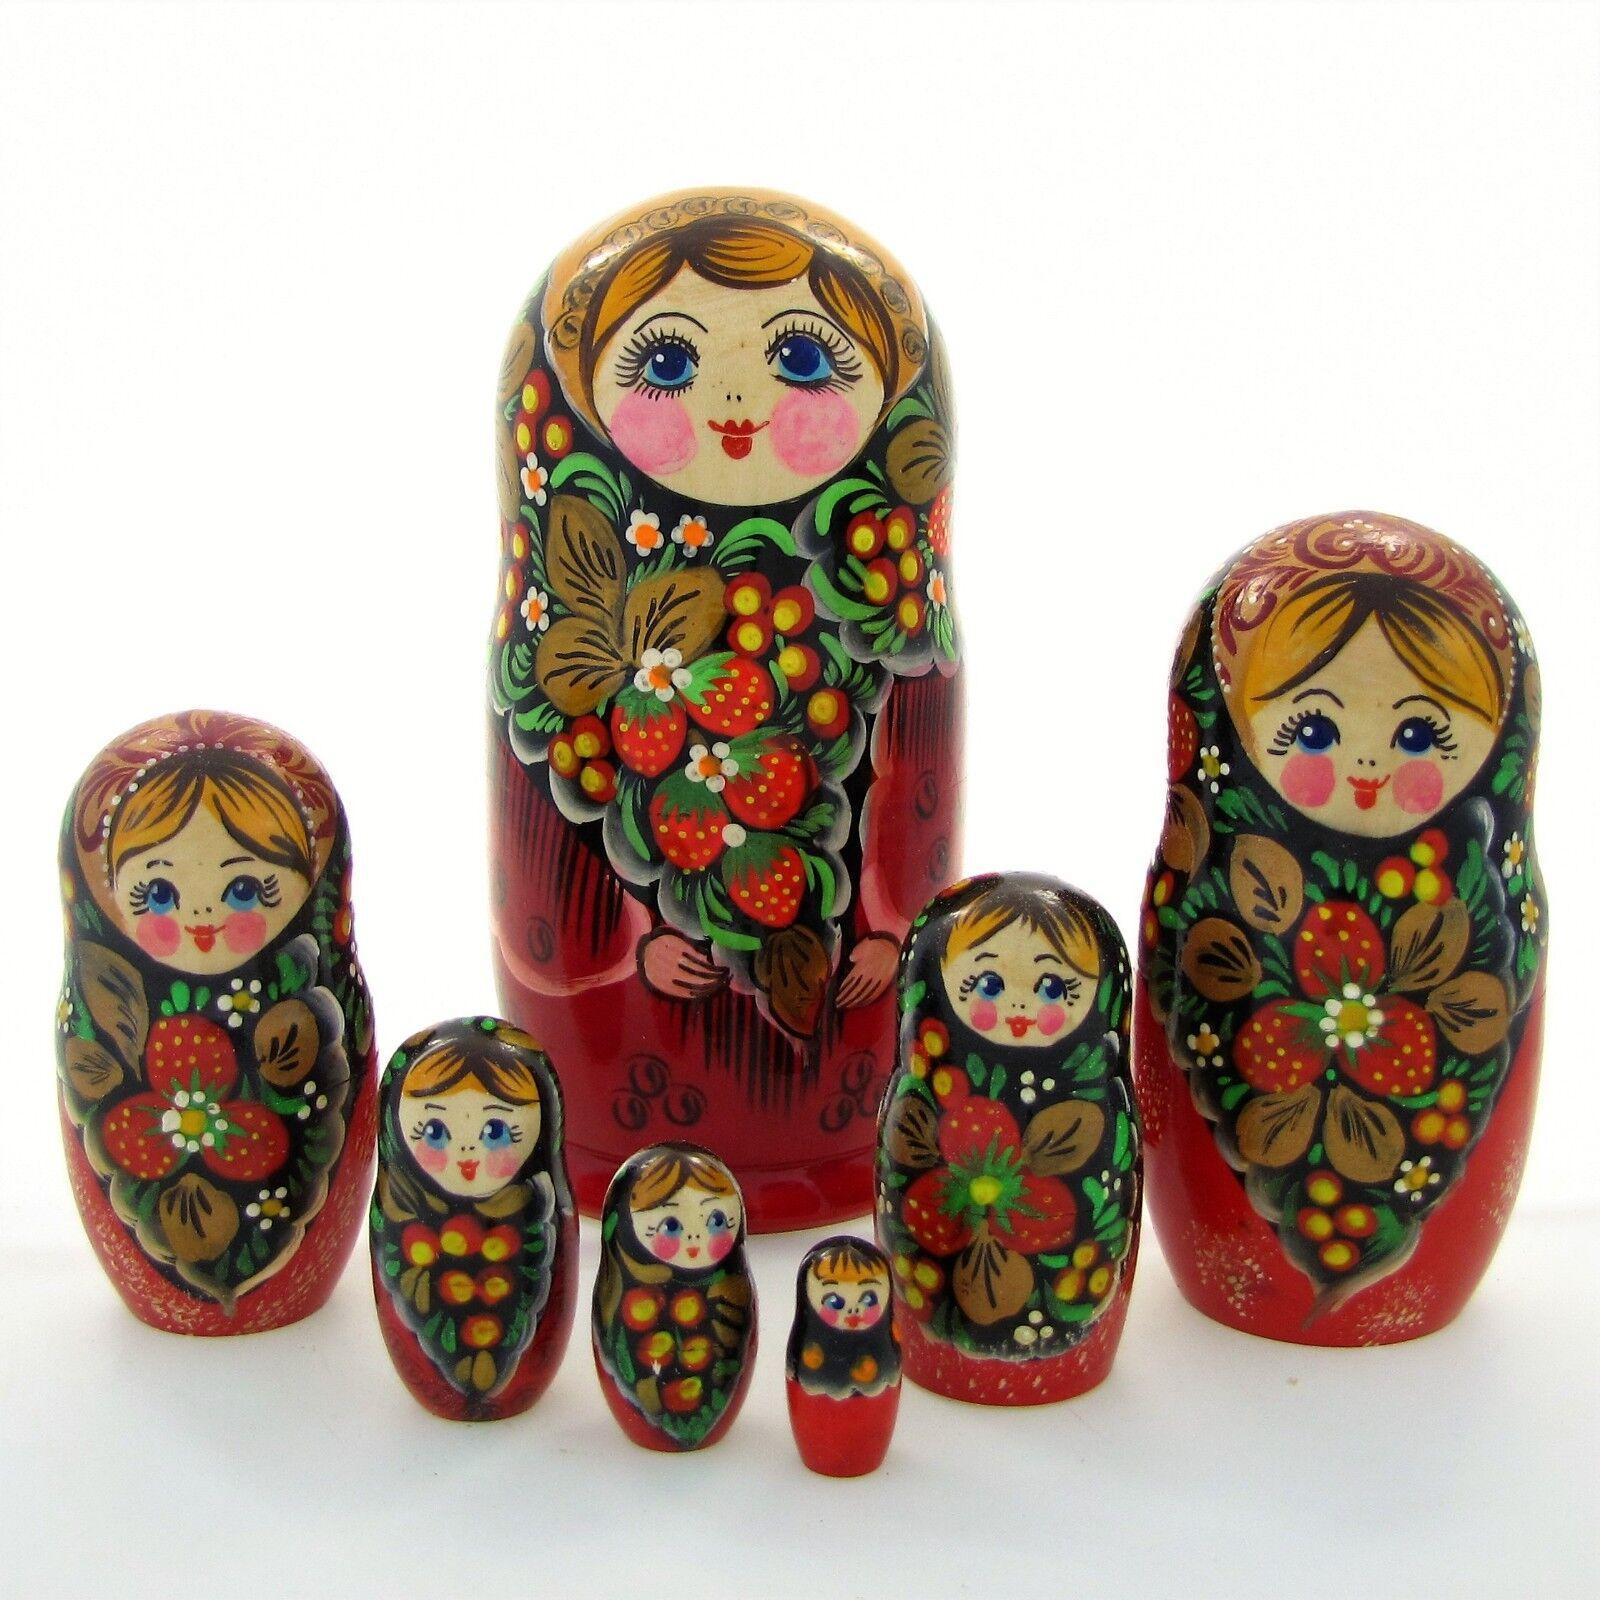 Poupées russes H22 peint main signé Matriochka Gigognes Nested Dolls Matrjoschka